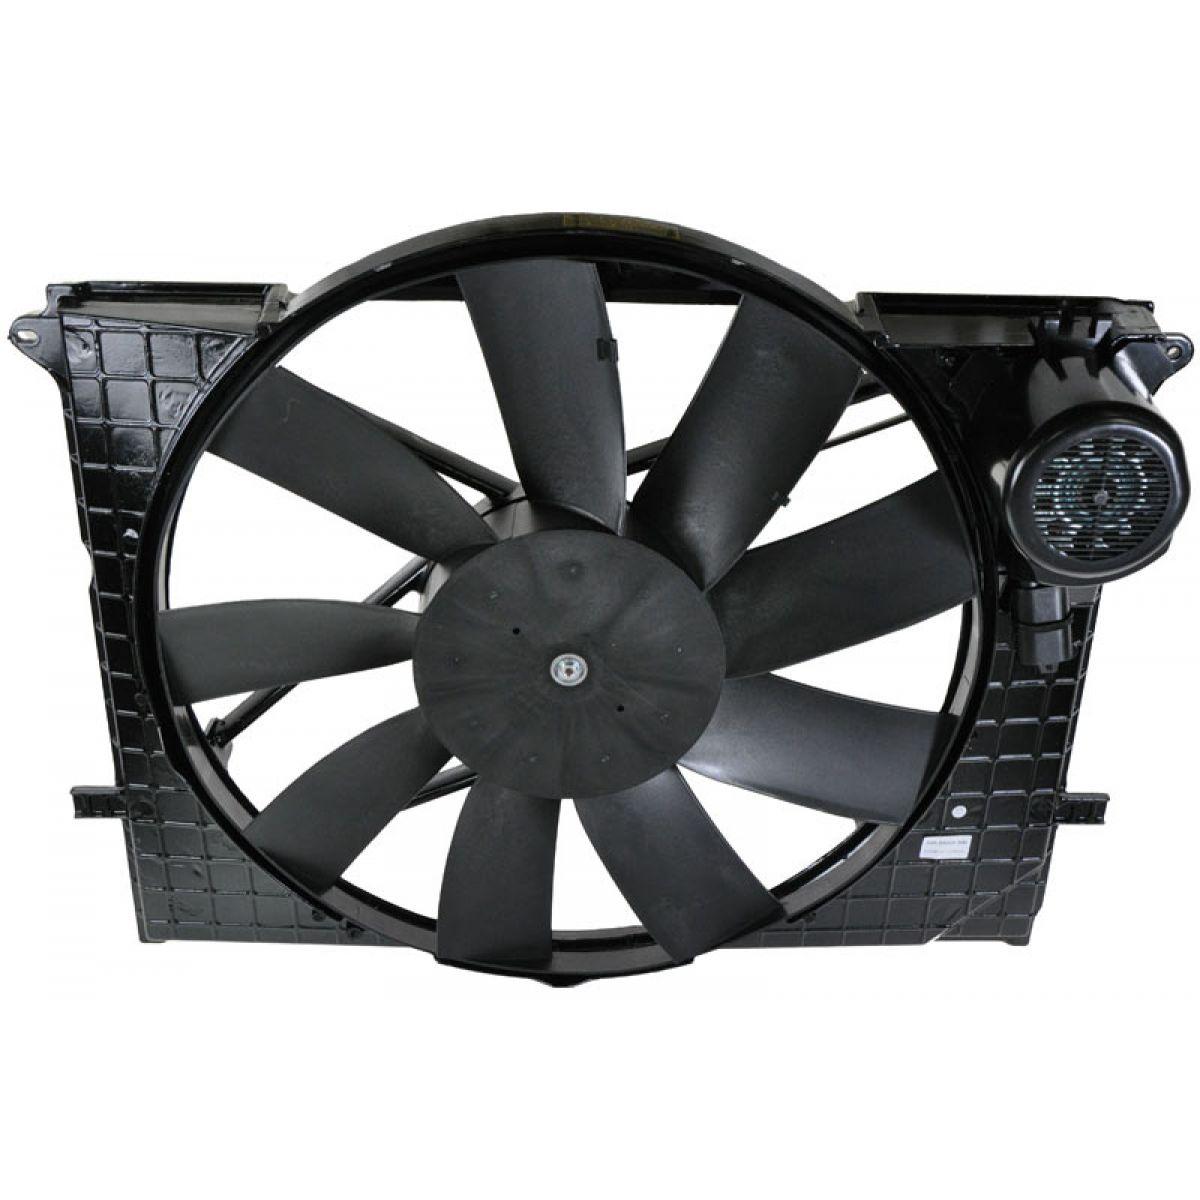 Radiator cooling fan motor for mercedes benz cl500 cl55 for Radiator fan motor price